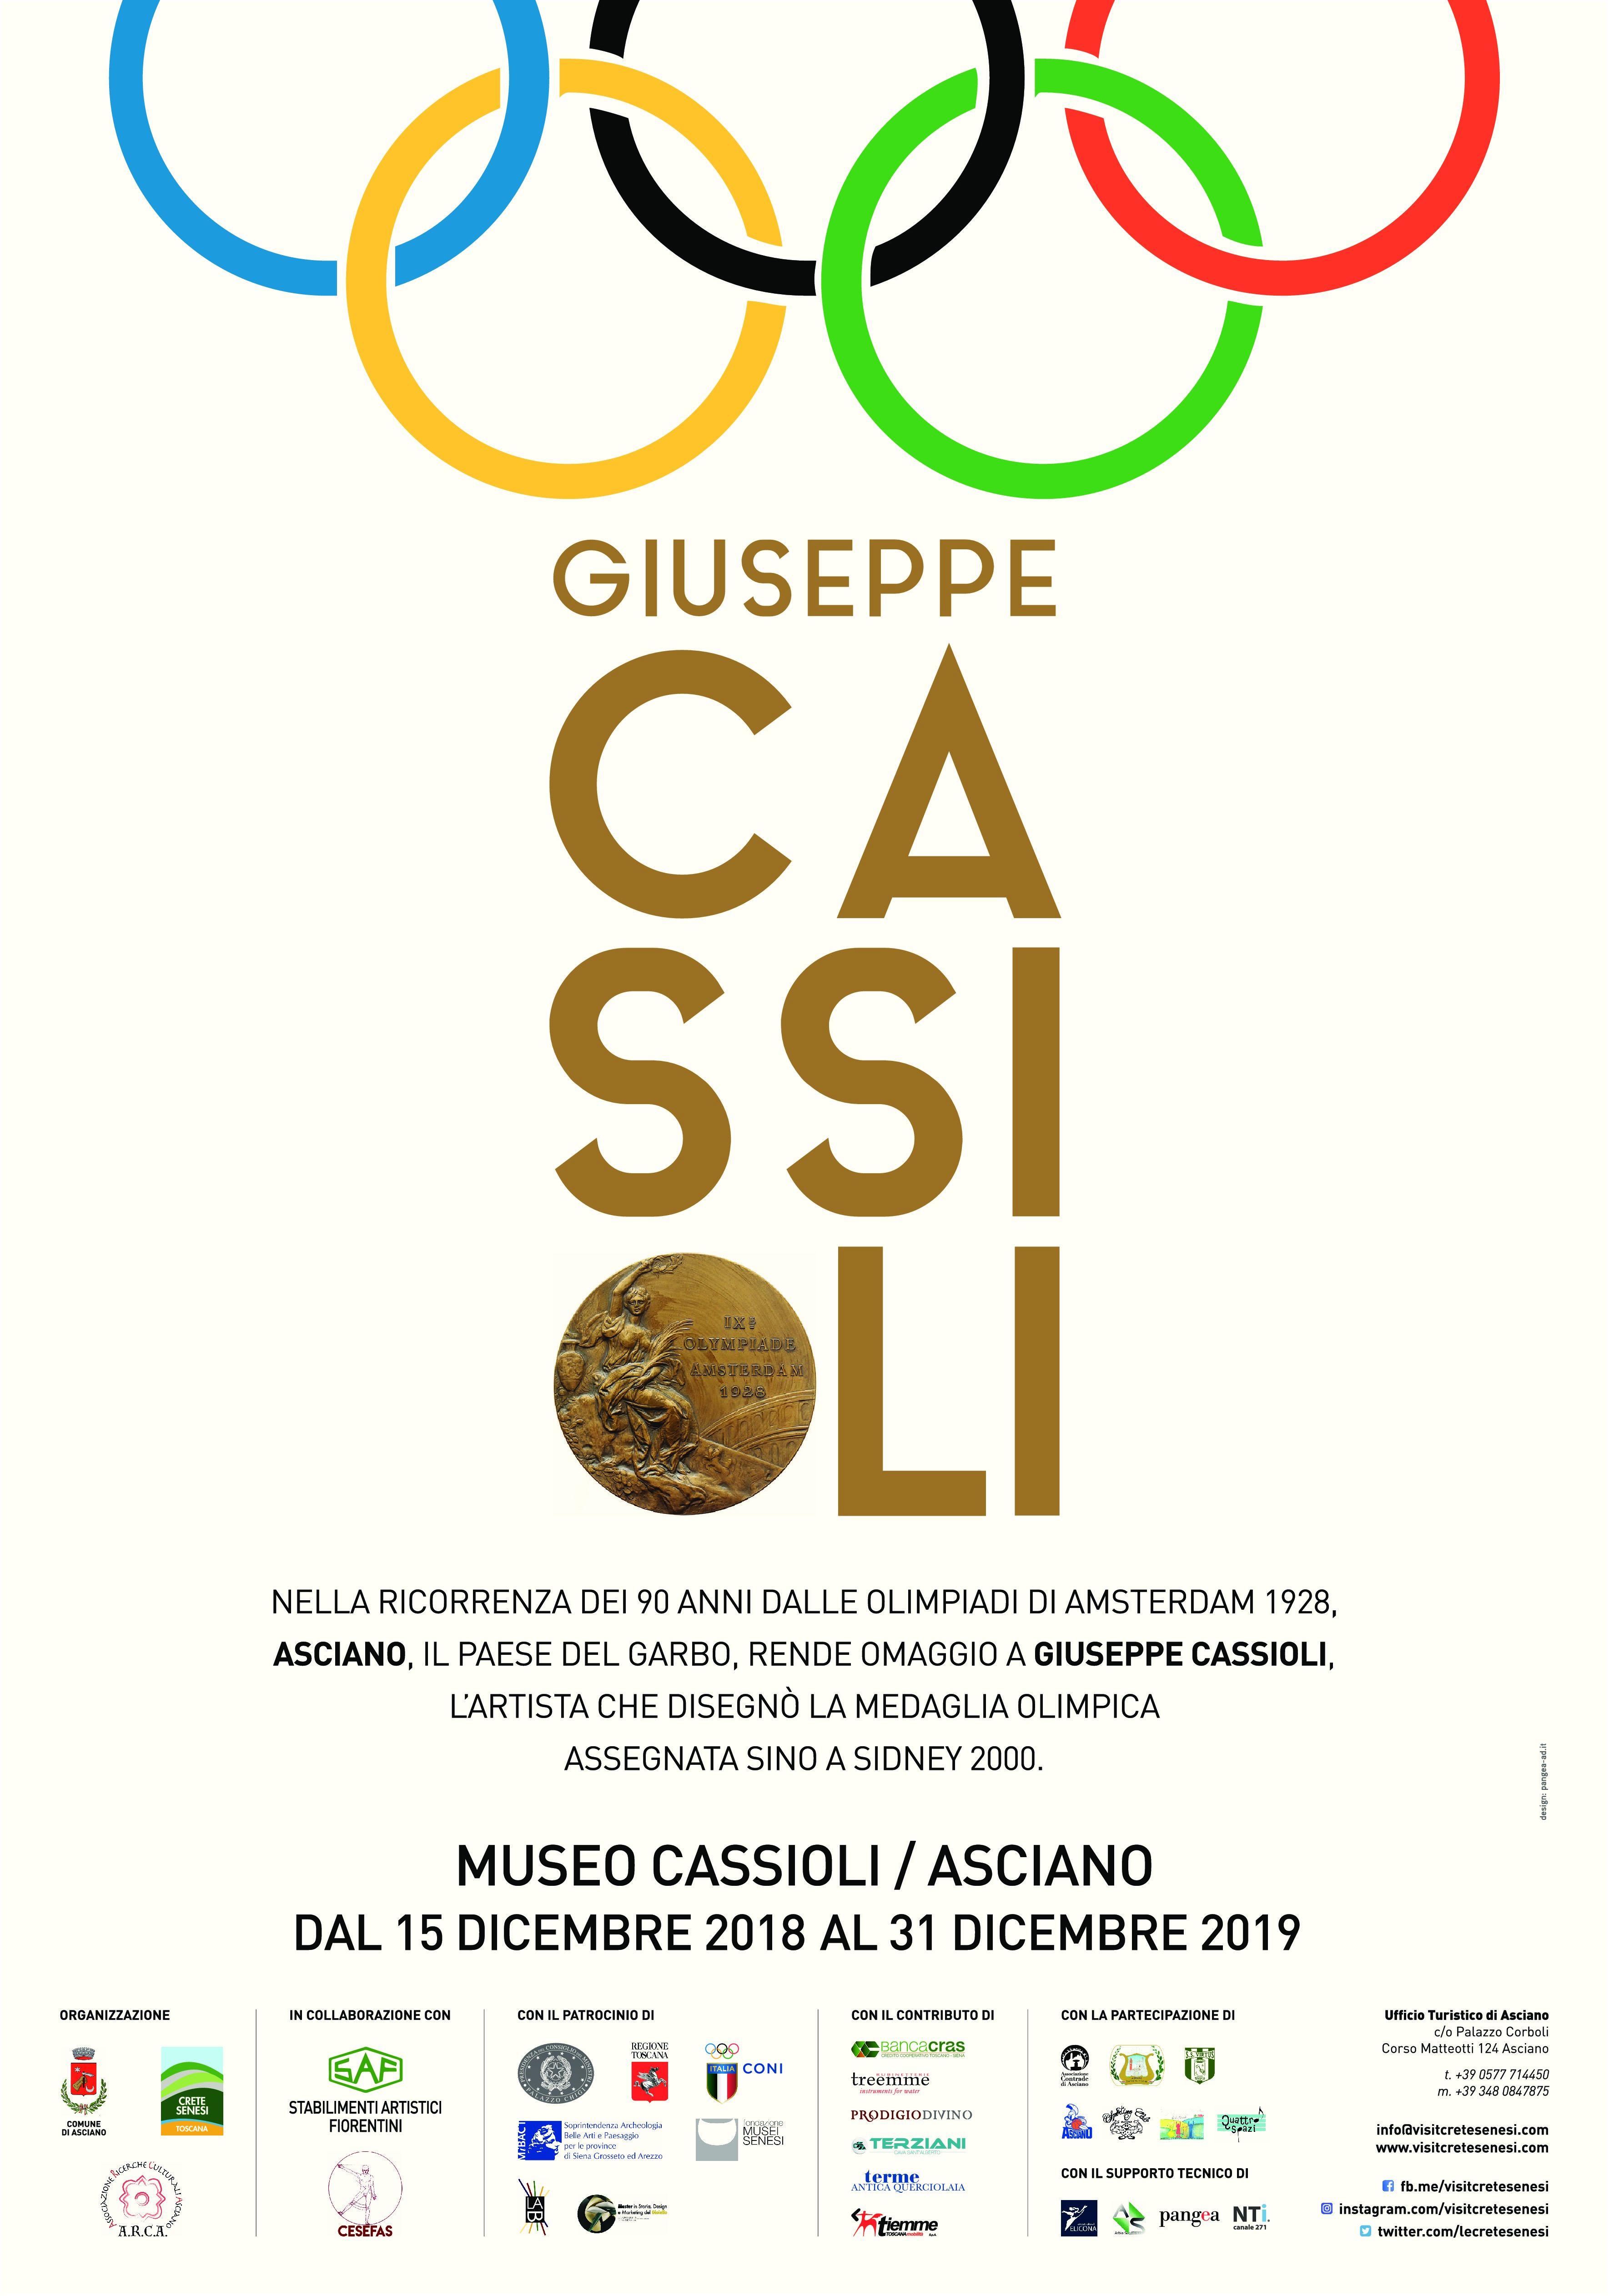 Partnership – Museo Giuseppe Cassioli